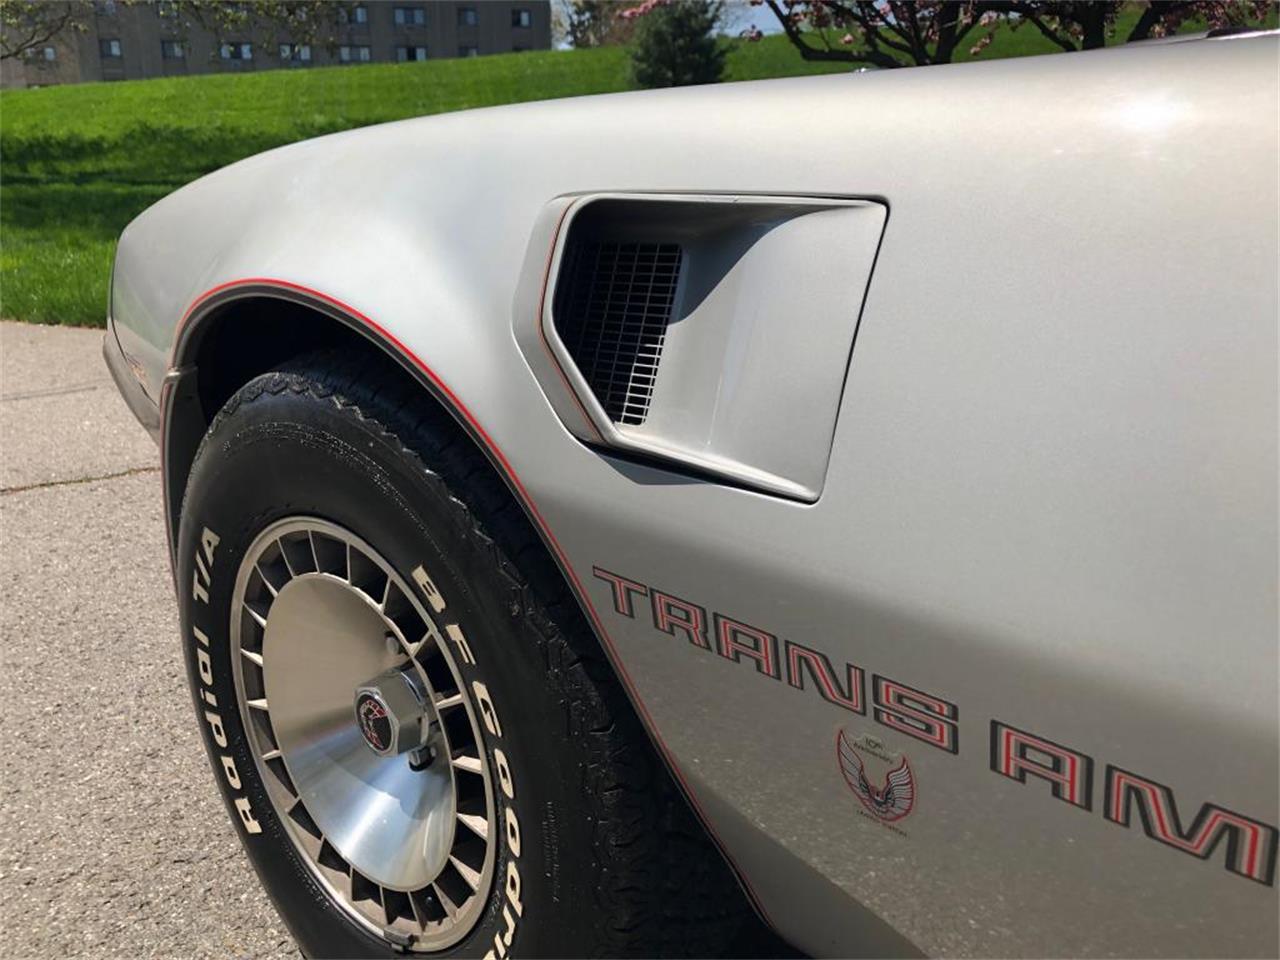 1979 Pontiac Firebird Trans Am (CC-1202658) for sale in Milford City, Connecticut